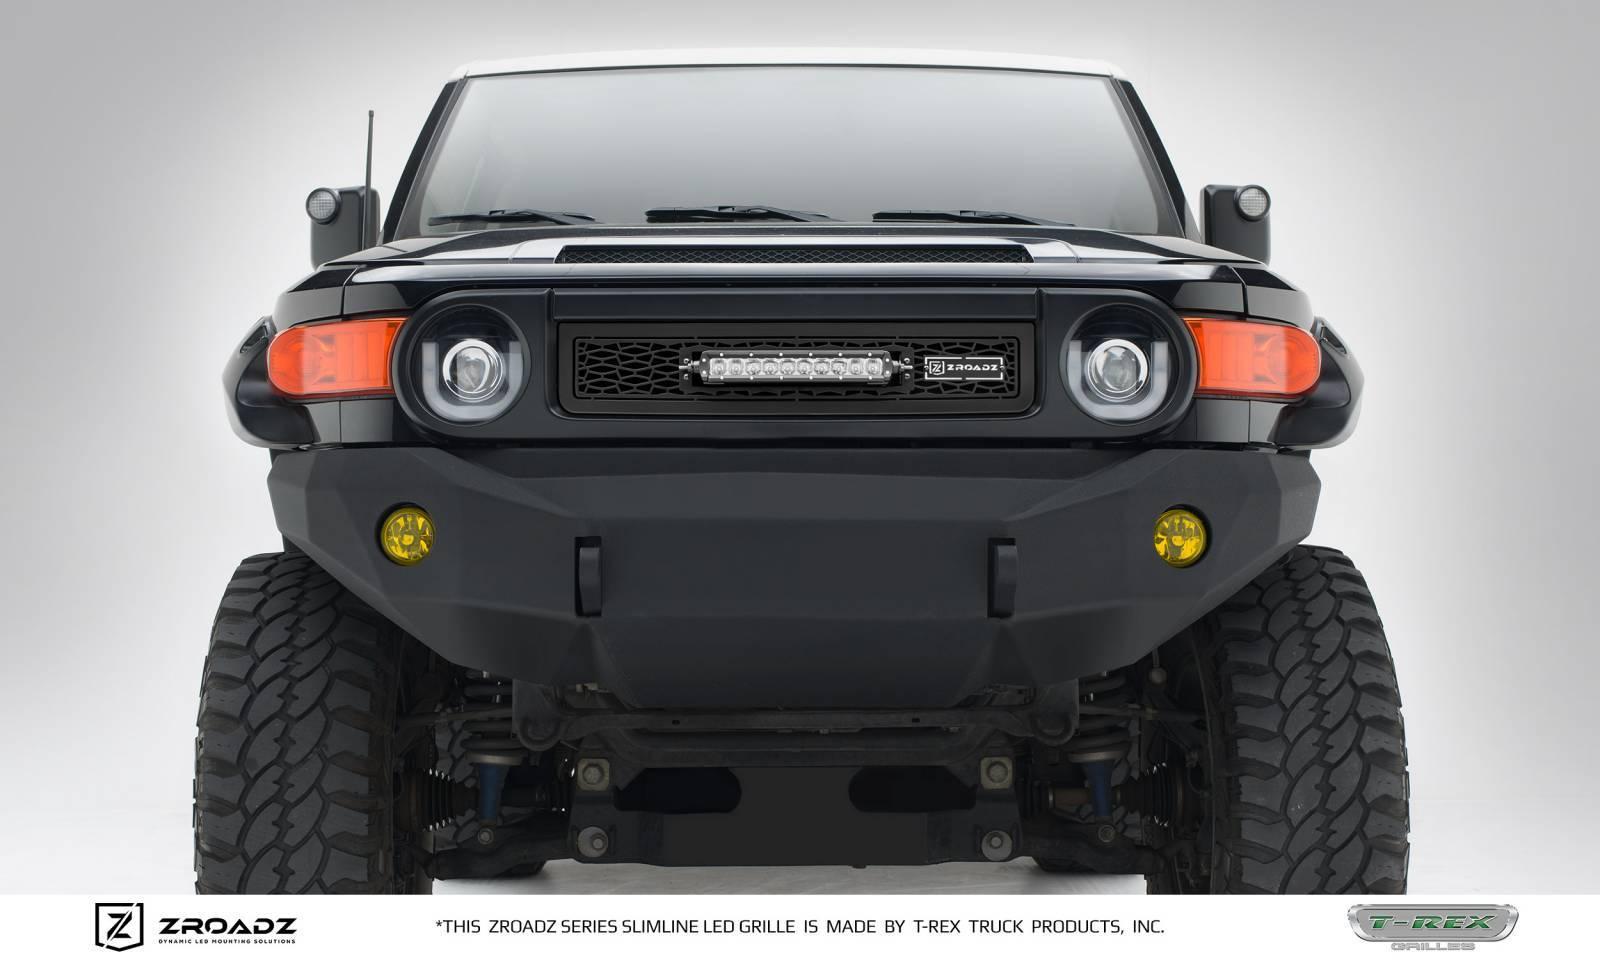 Toyota FJ Cruiser - ZROADZ Series - Main Insert - Grille w/ One 10 Inch  Slim Line Single Row LED Light Bar - Includes Universal Wiring Harness -  Part# ...